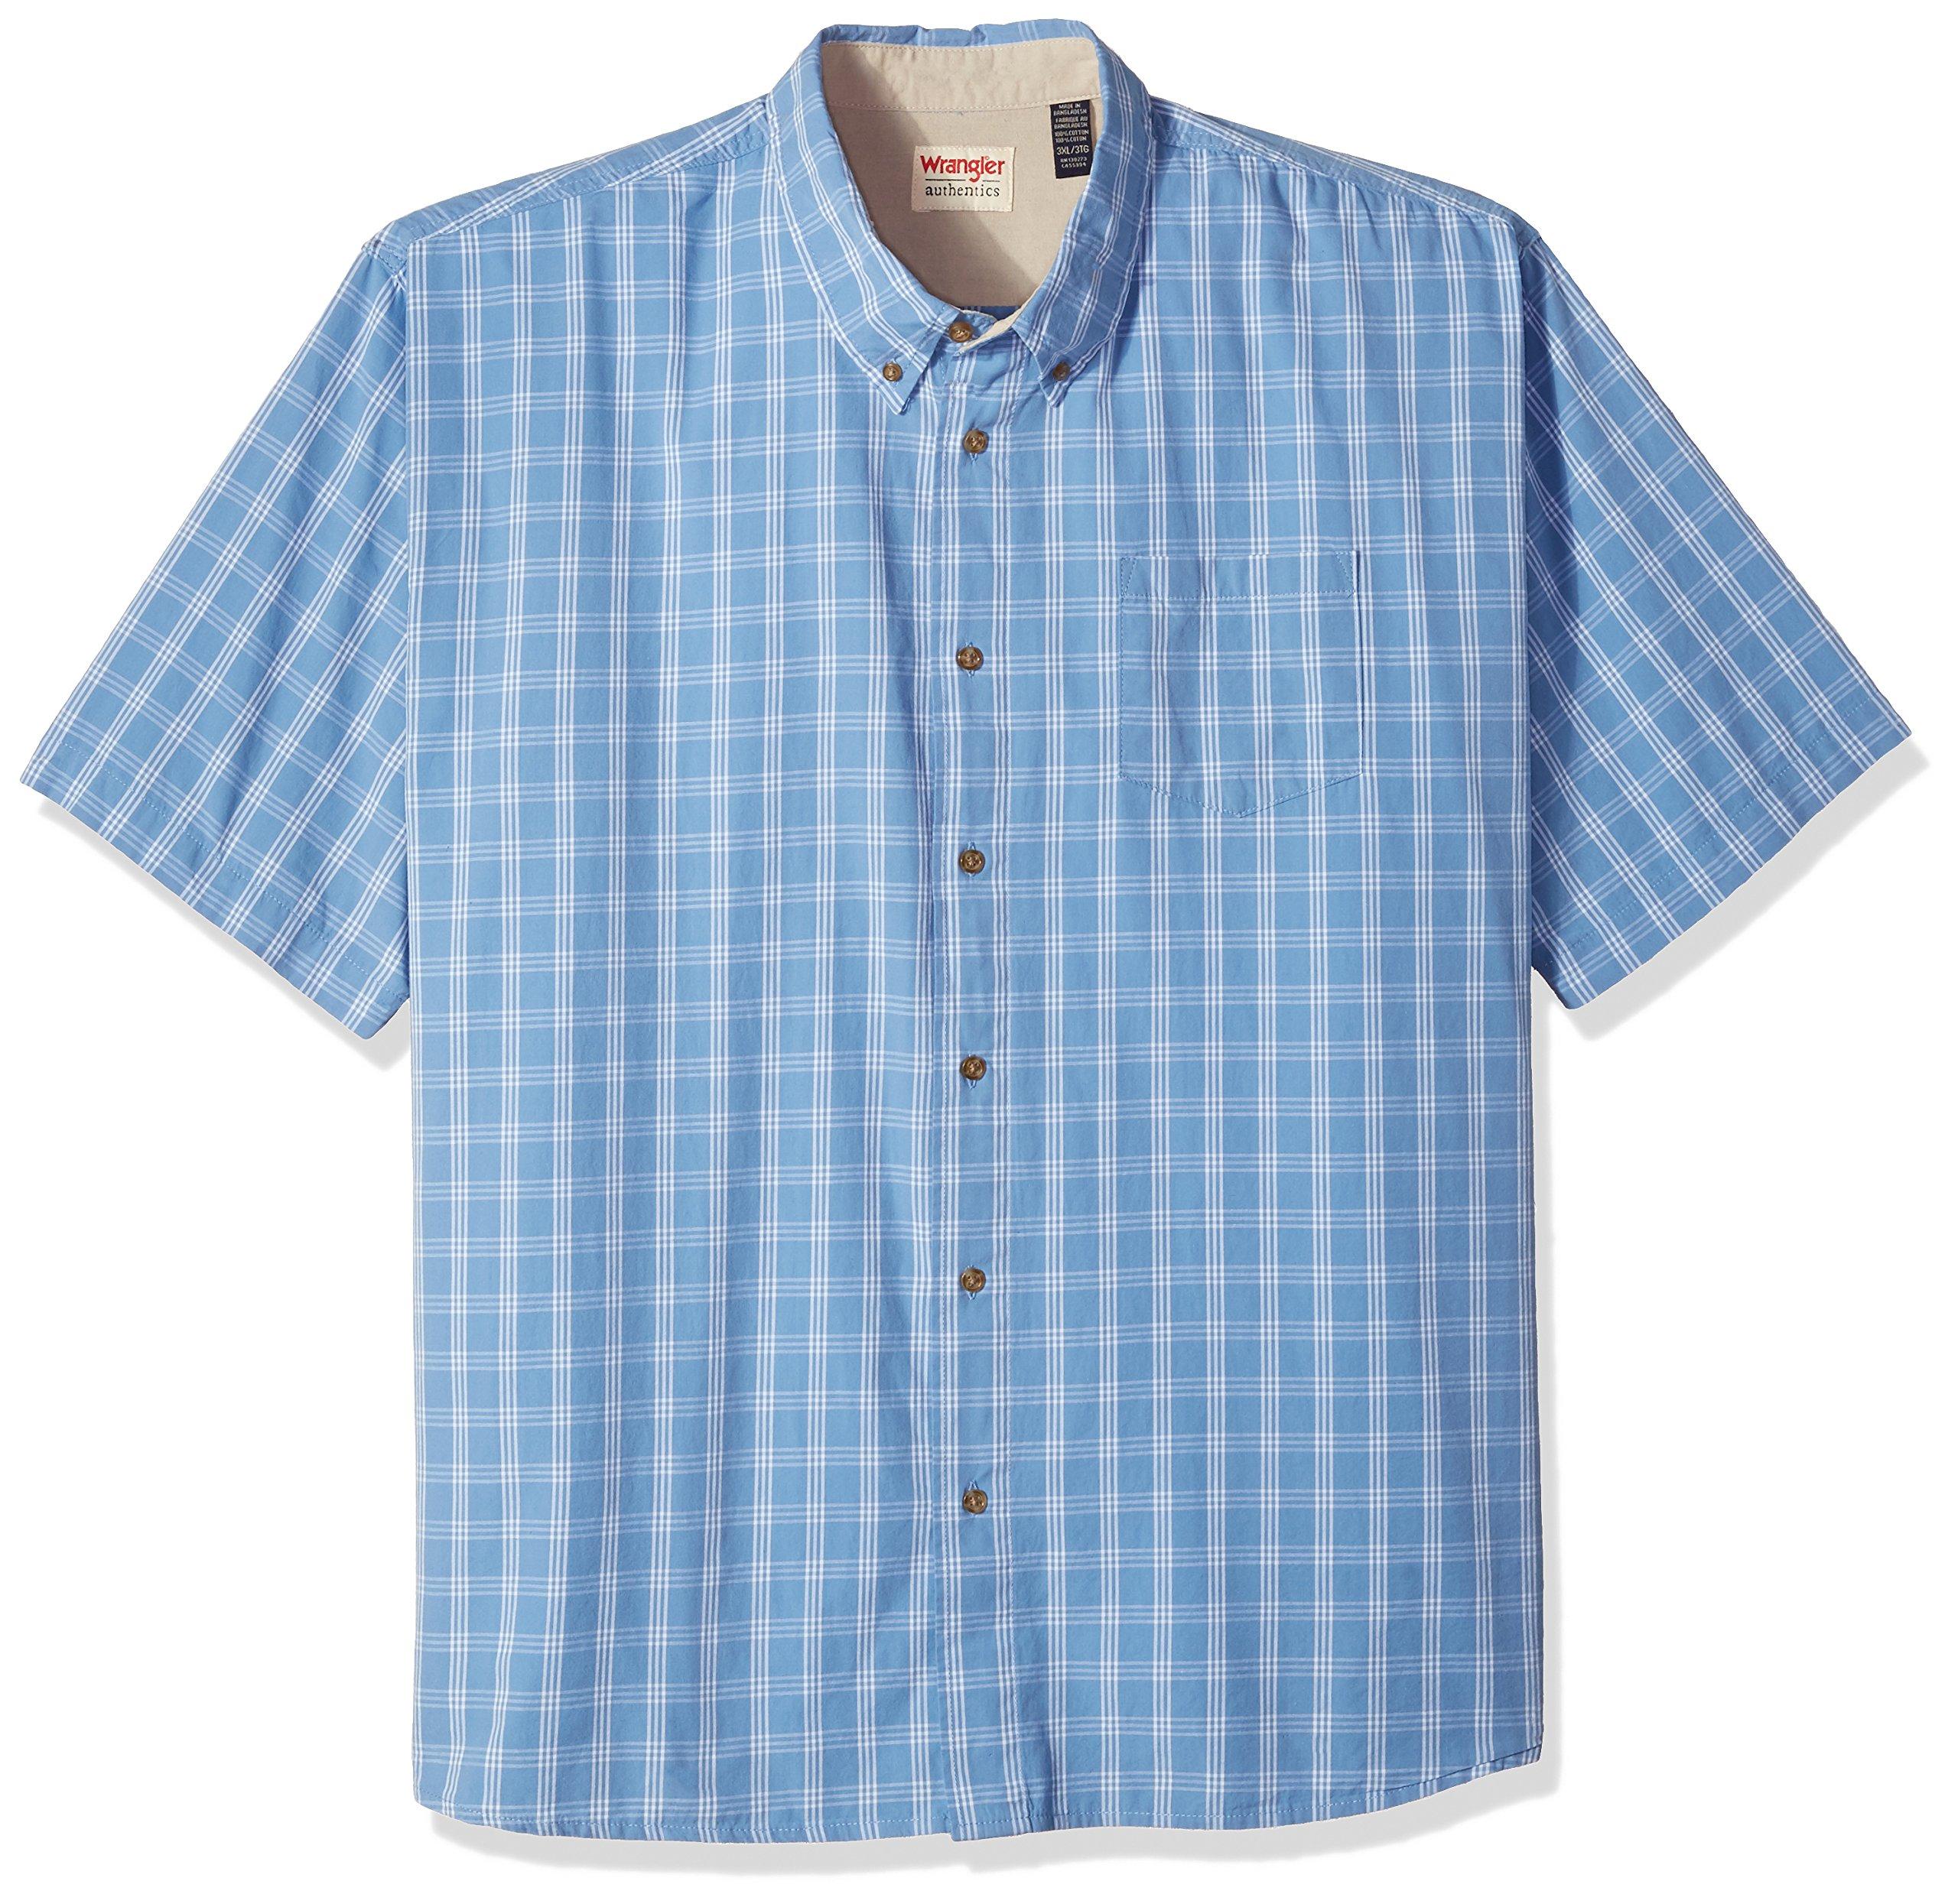 Wrangler Authentics Men's Big & Tall Short Sleeve Plaid Woven Shirt, Rivera, 3XL